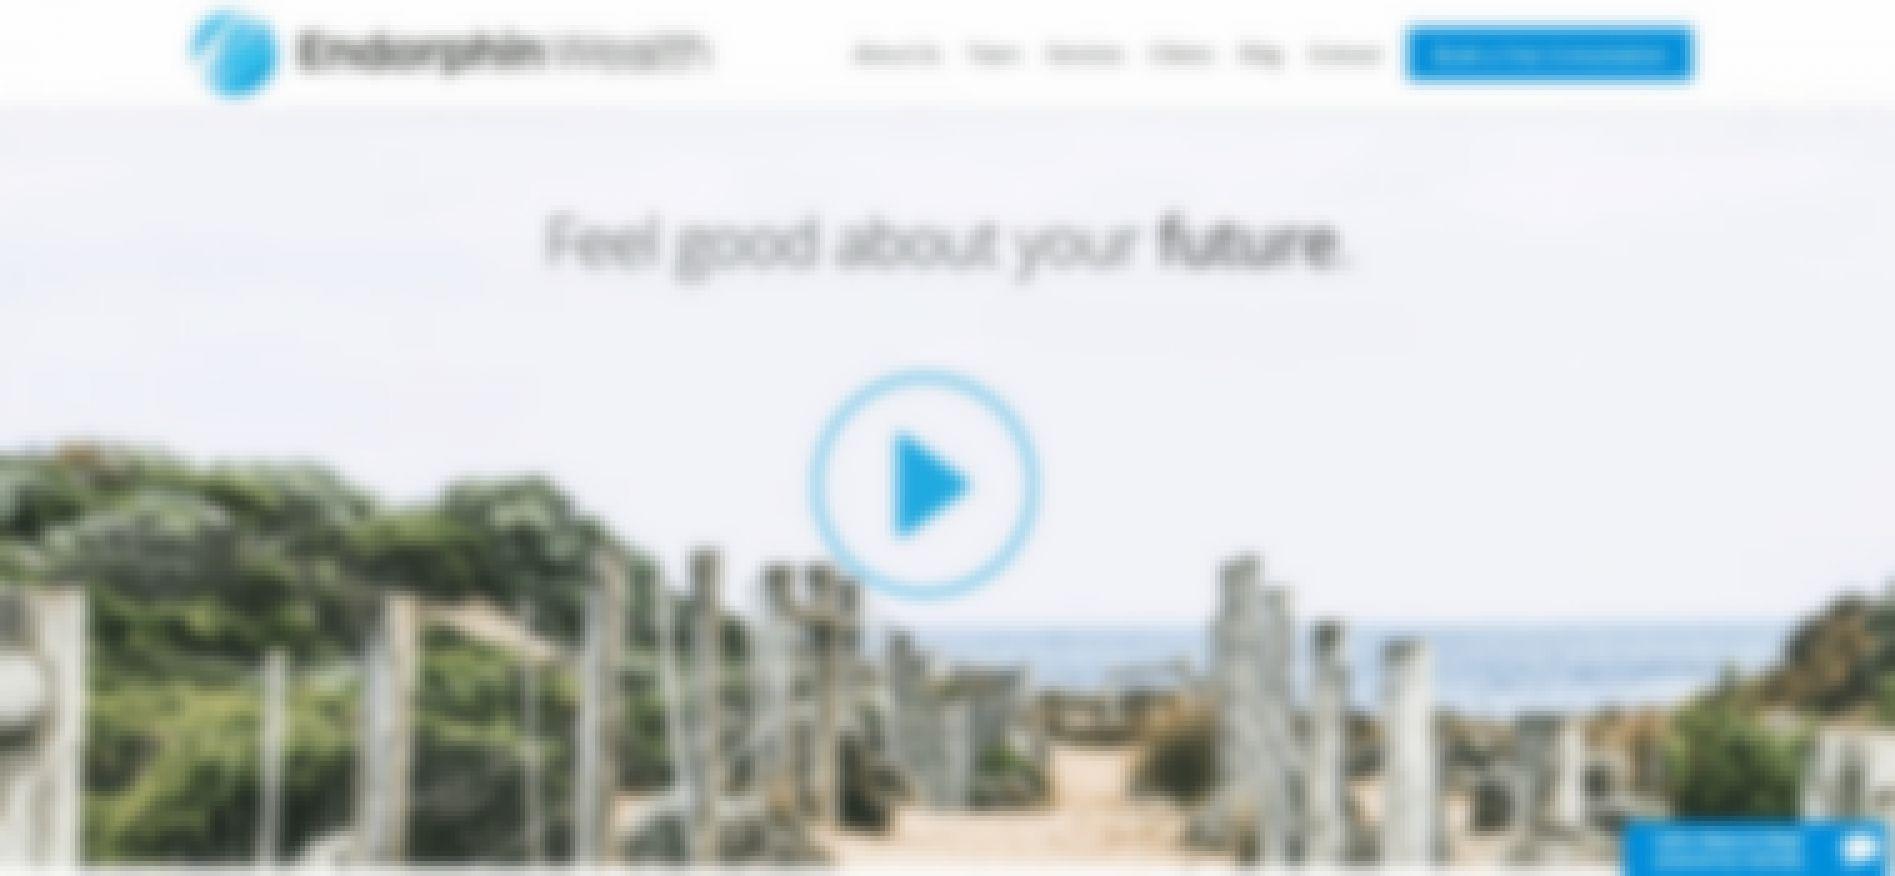 endorphin wealth